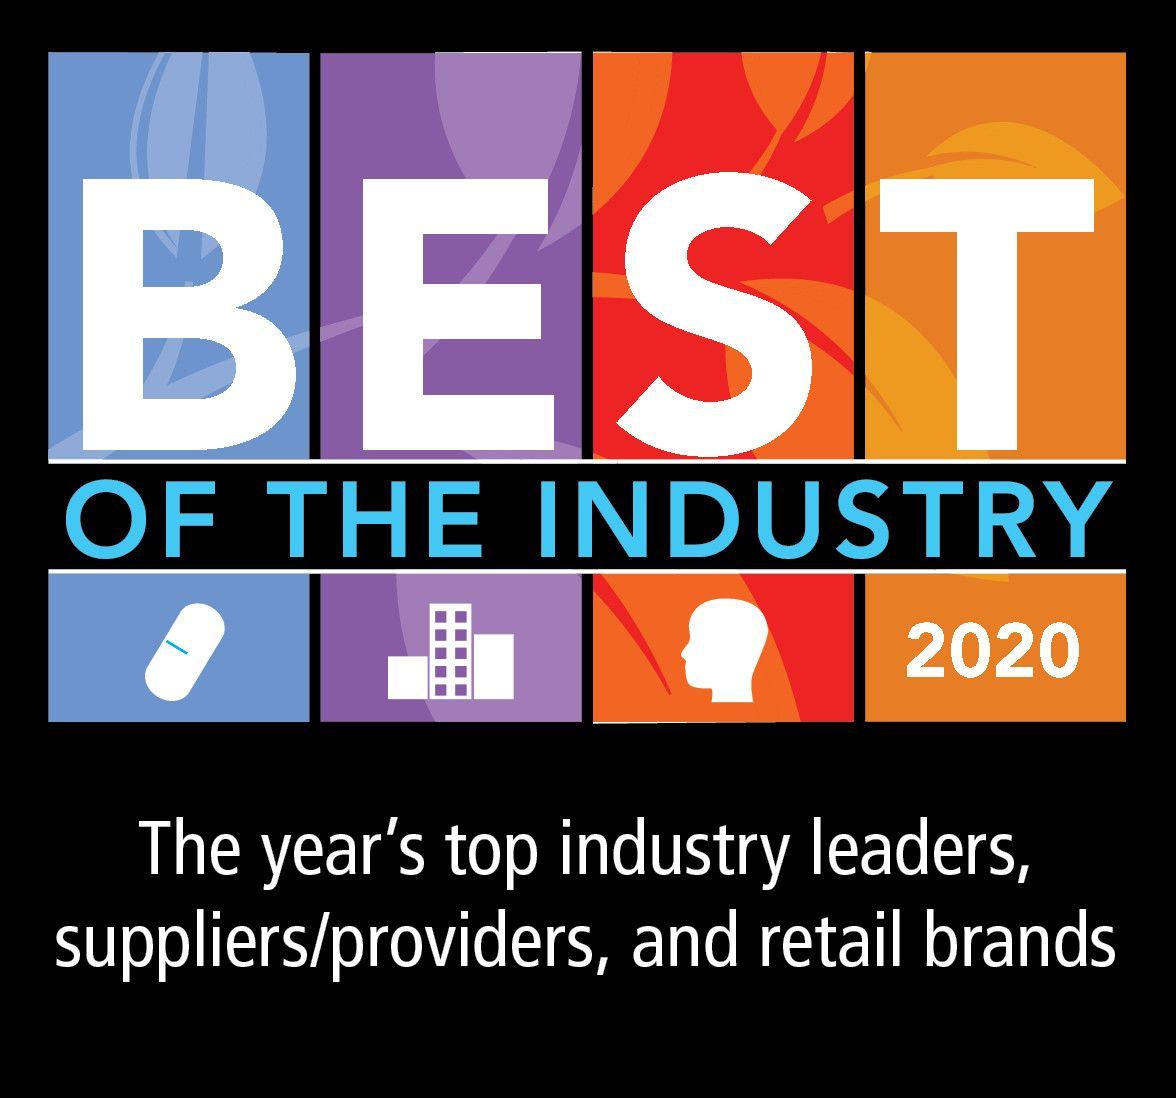 CBD Daily News Dec 11 2020 - The CBD Store Tinctures, Capsules, Topicals| Buy CBD